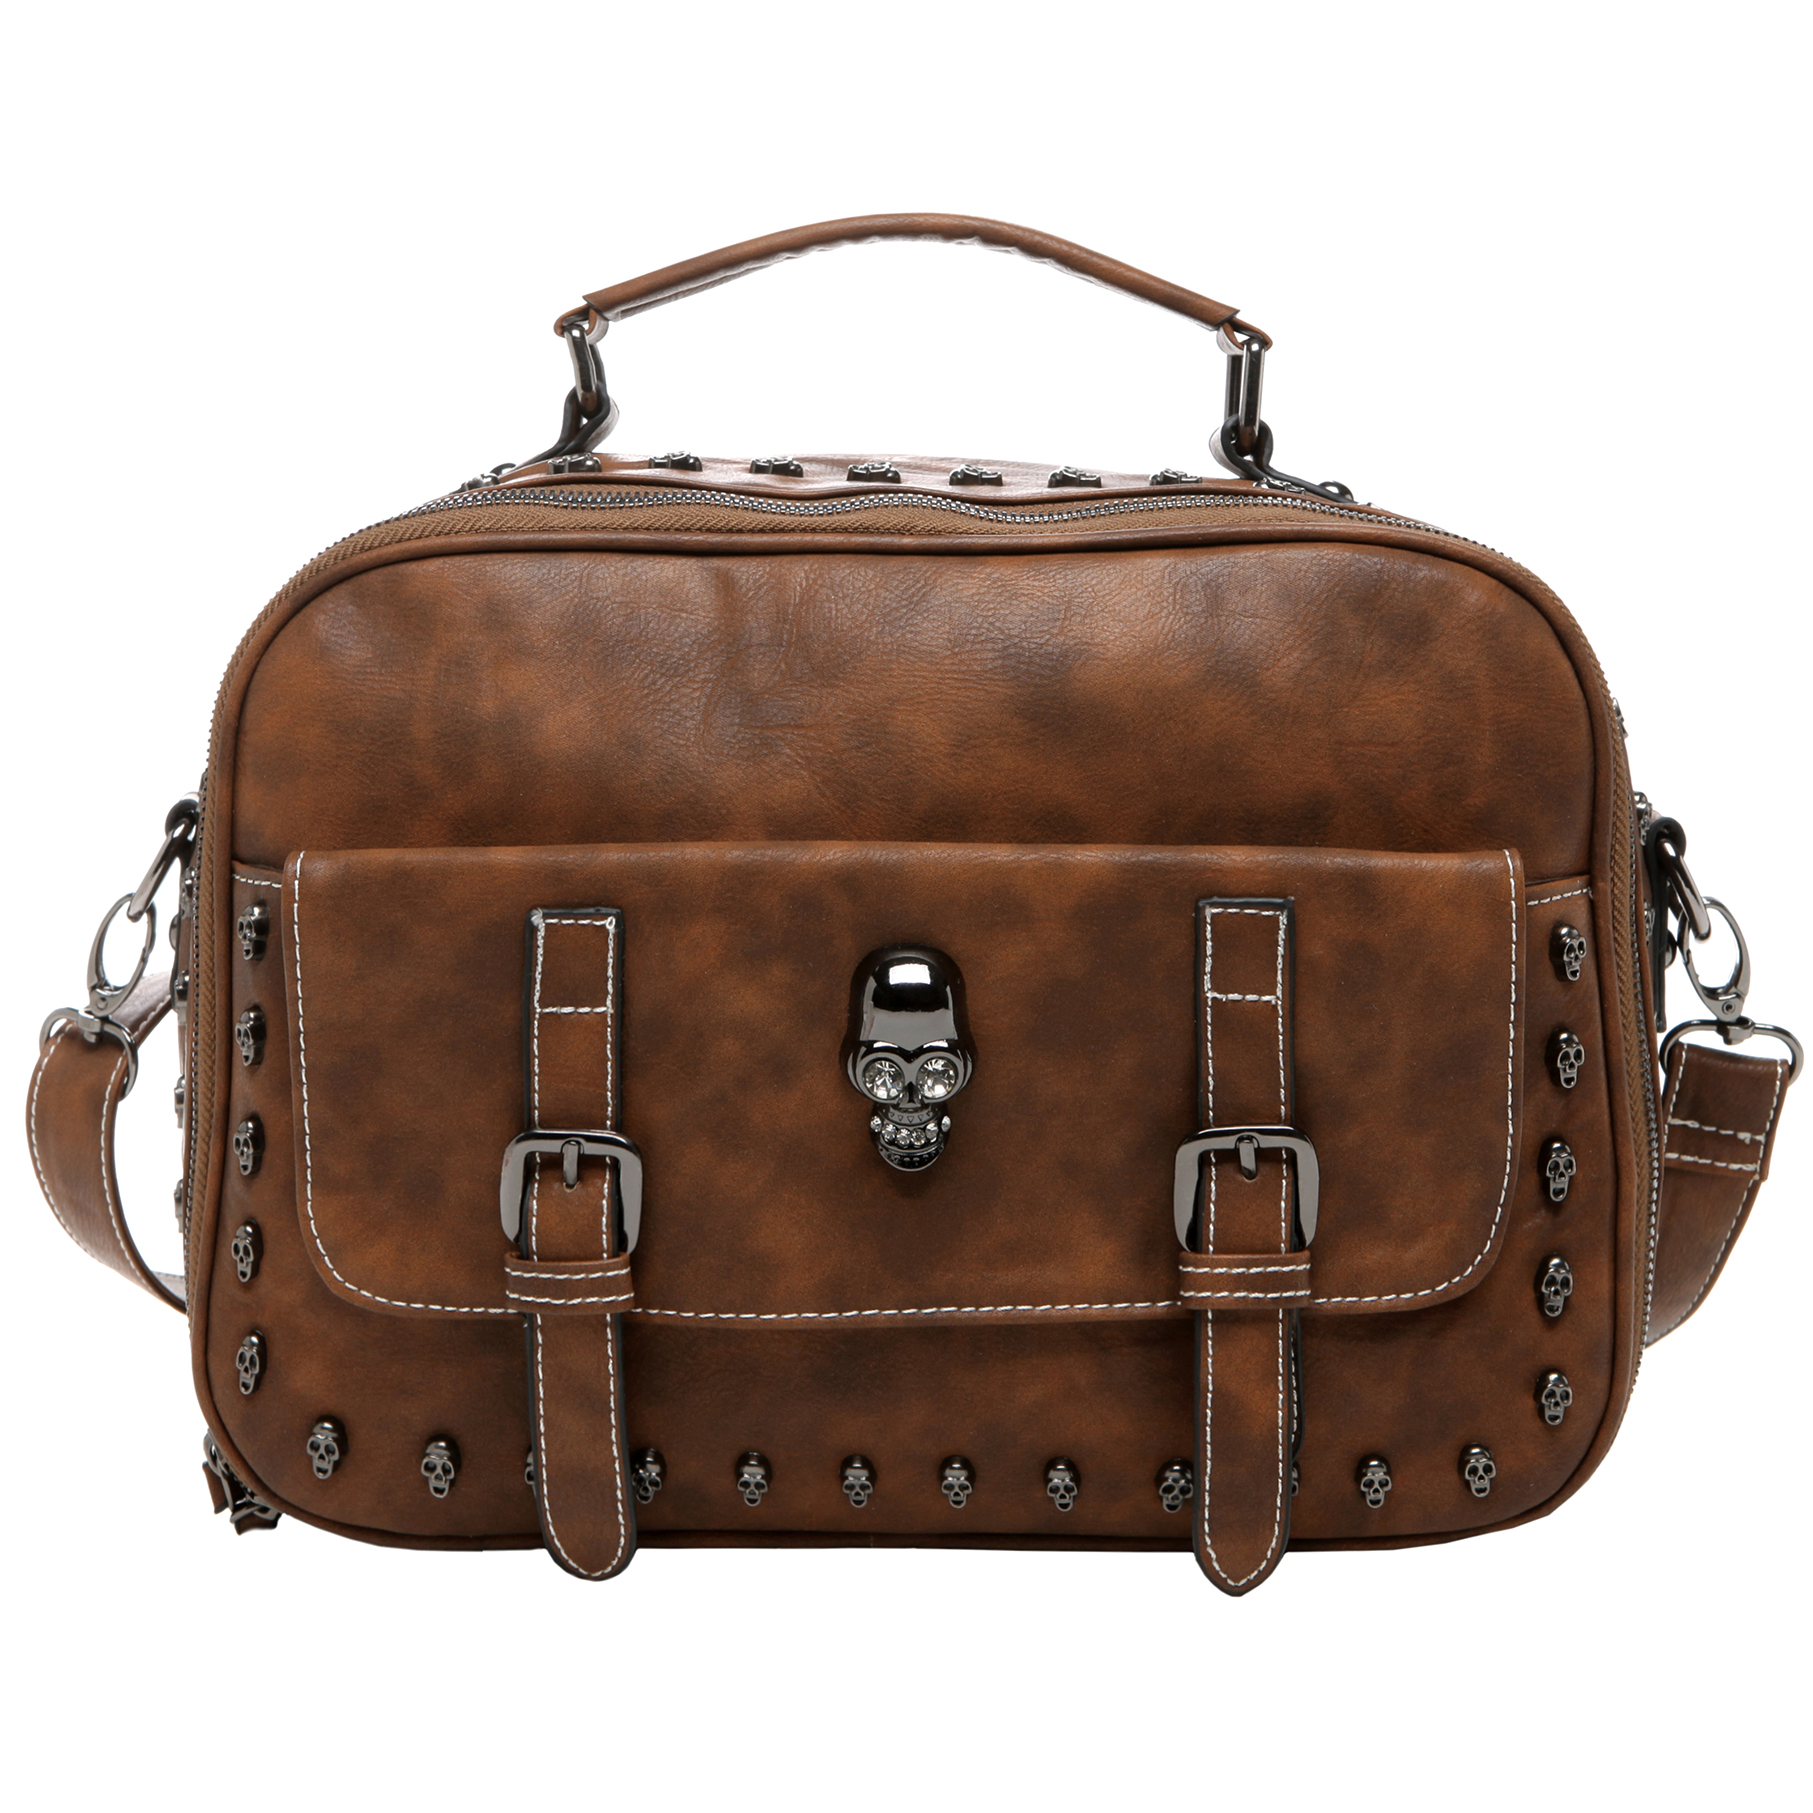 Women's Designer Handbag MASON in Brown Gothic Style Satchel front image